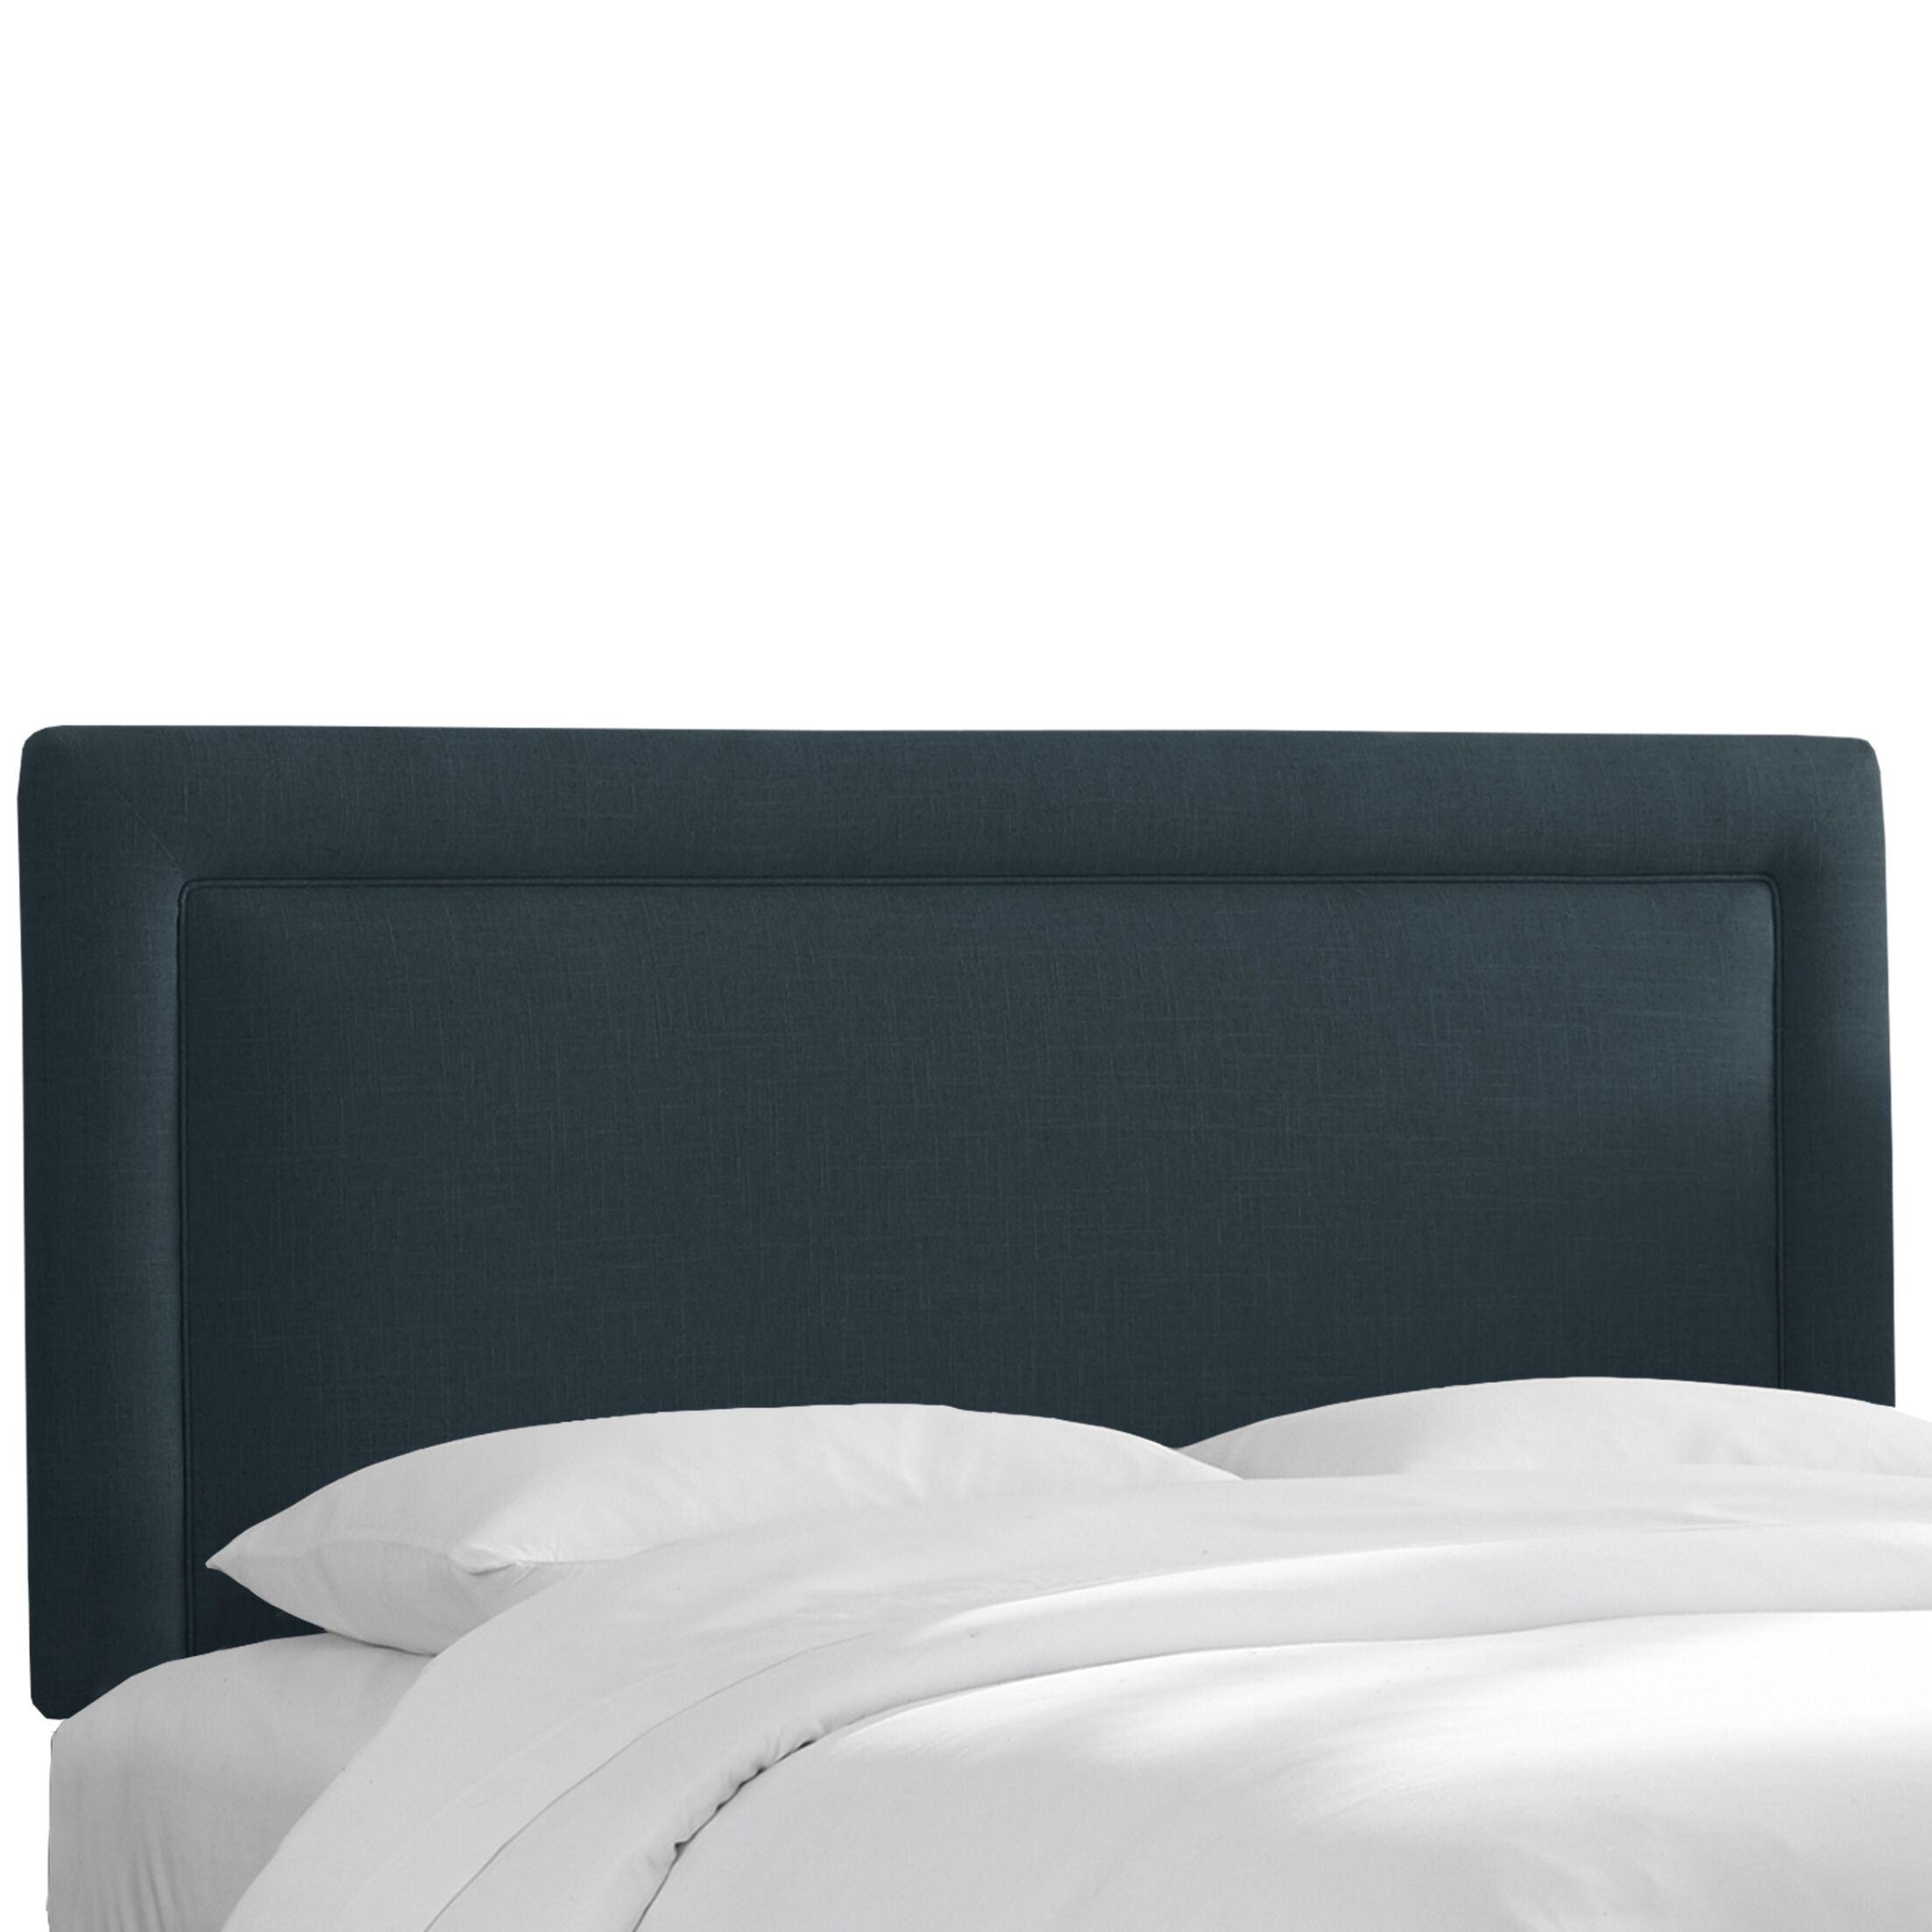 Chambers Upholstered Panel Headboard Size: Twin, Upholstery: Navy